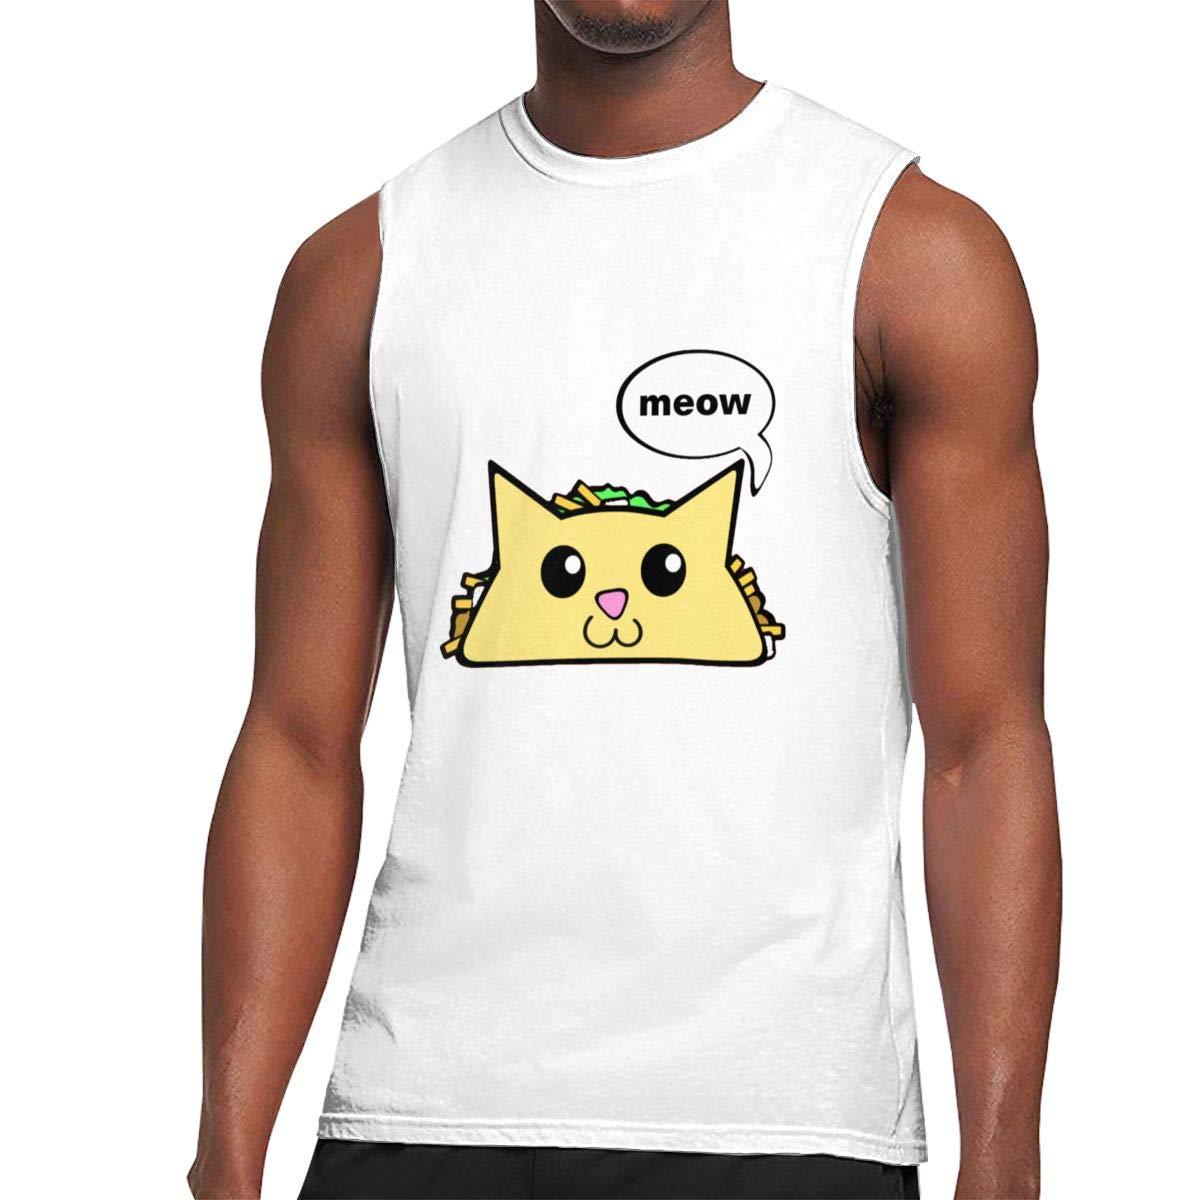 Seuriamin Taco Cat S Basic Outdoor Sleeveless Muscle Short Sleeve T Shirts